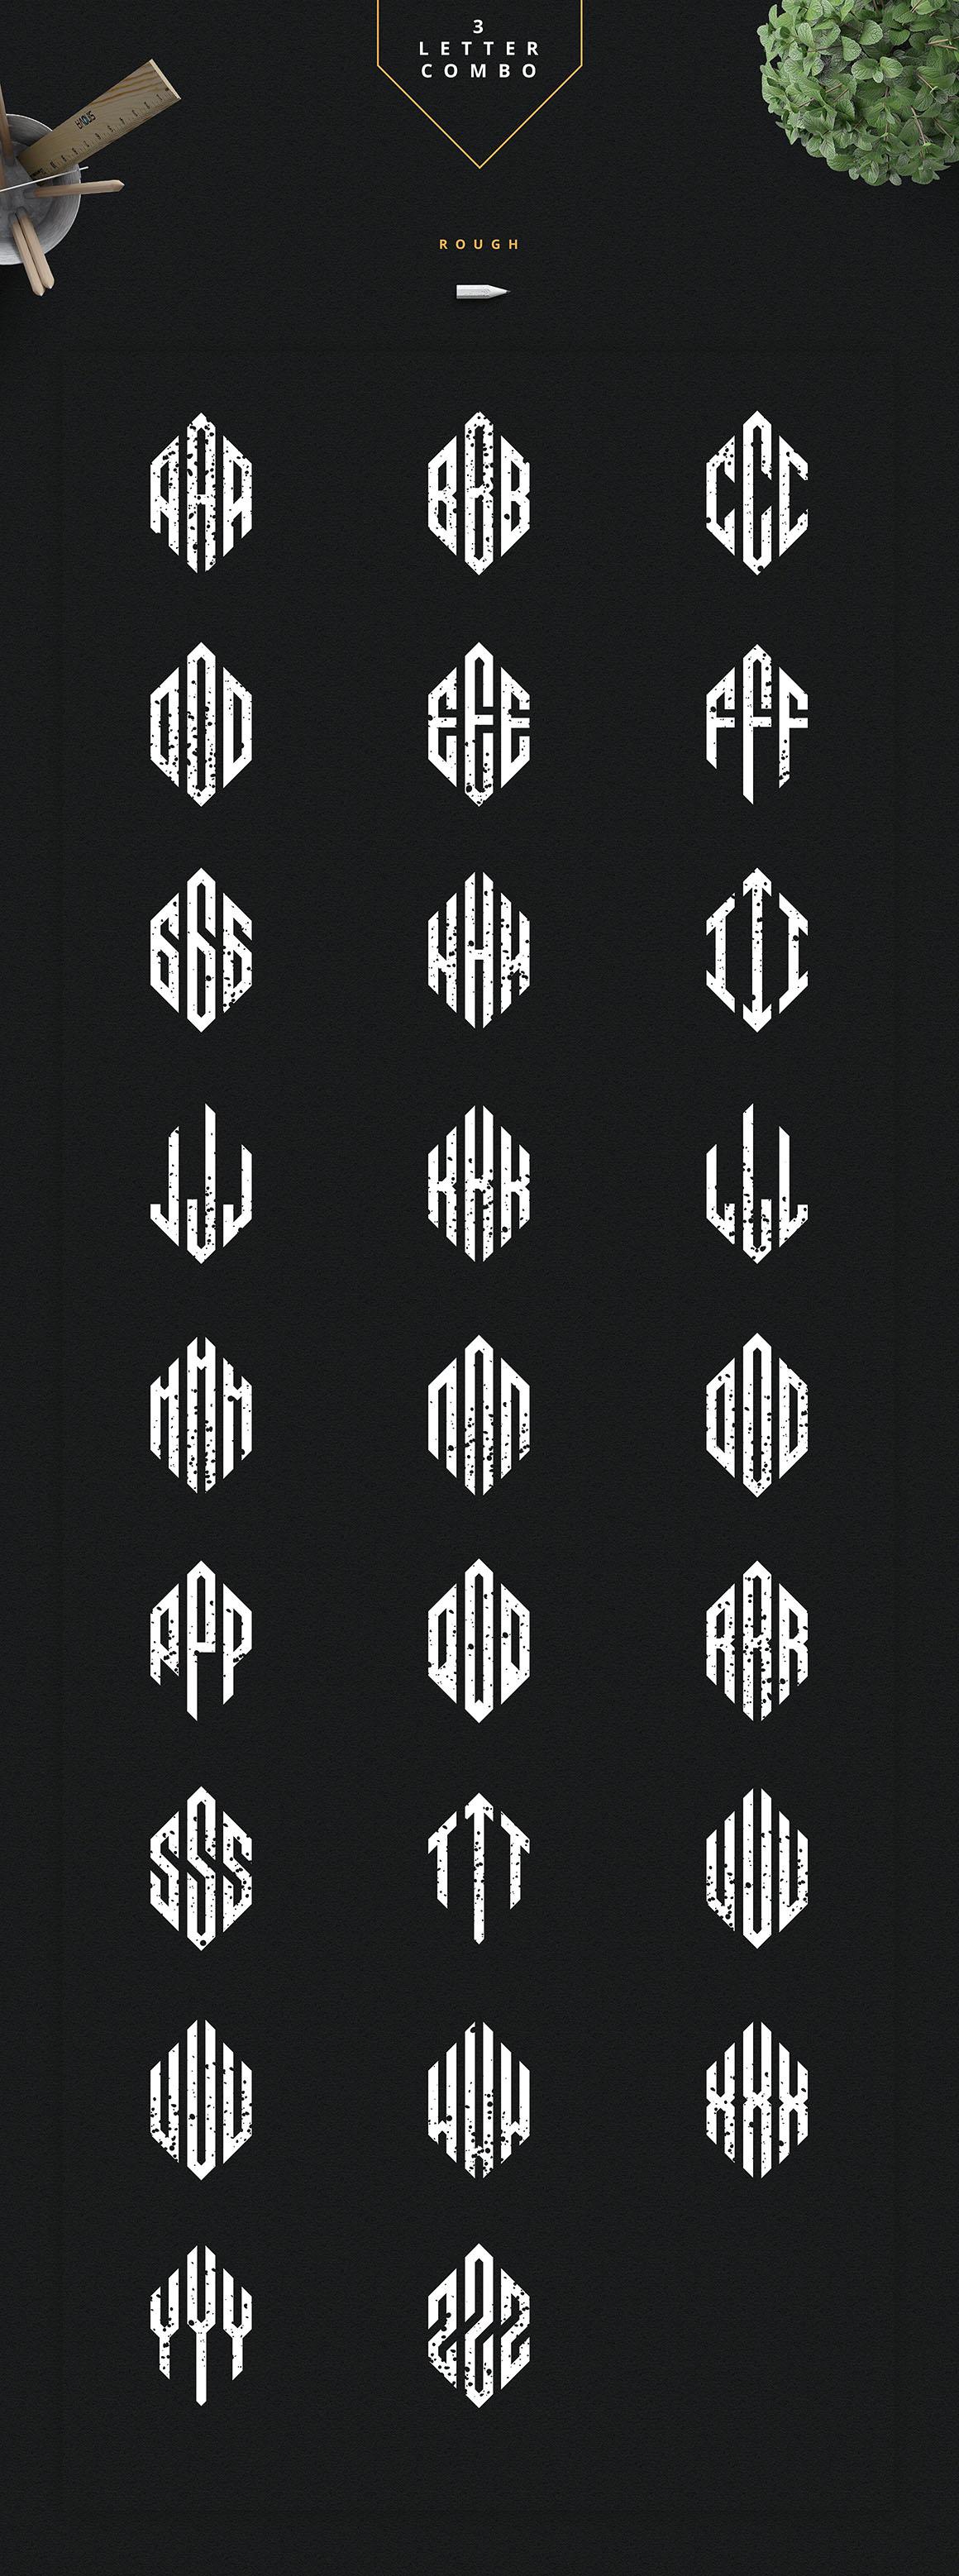 6in1-Ultimate-Monogram-creator-10.jpg